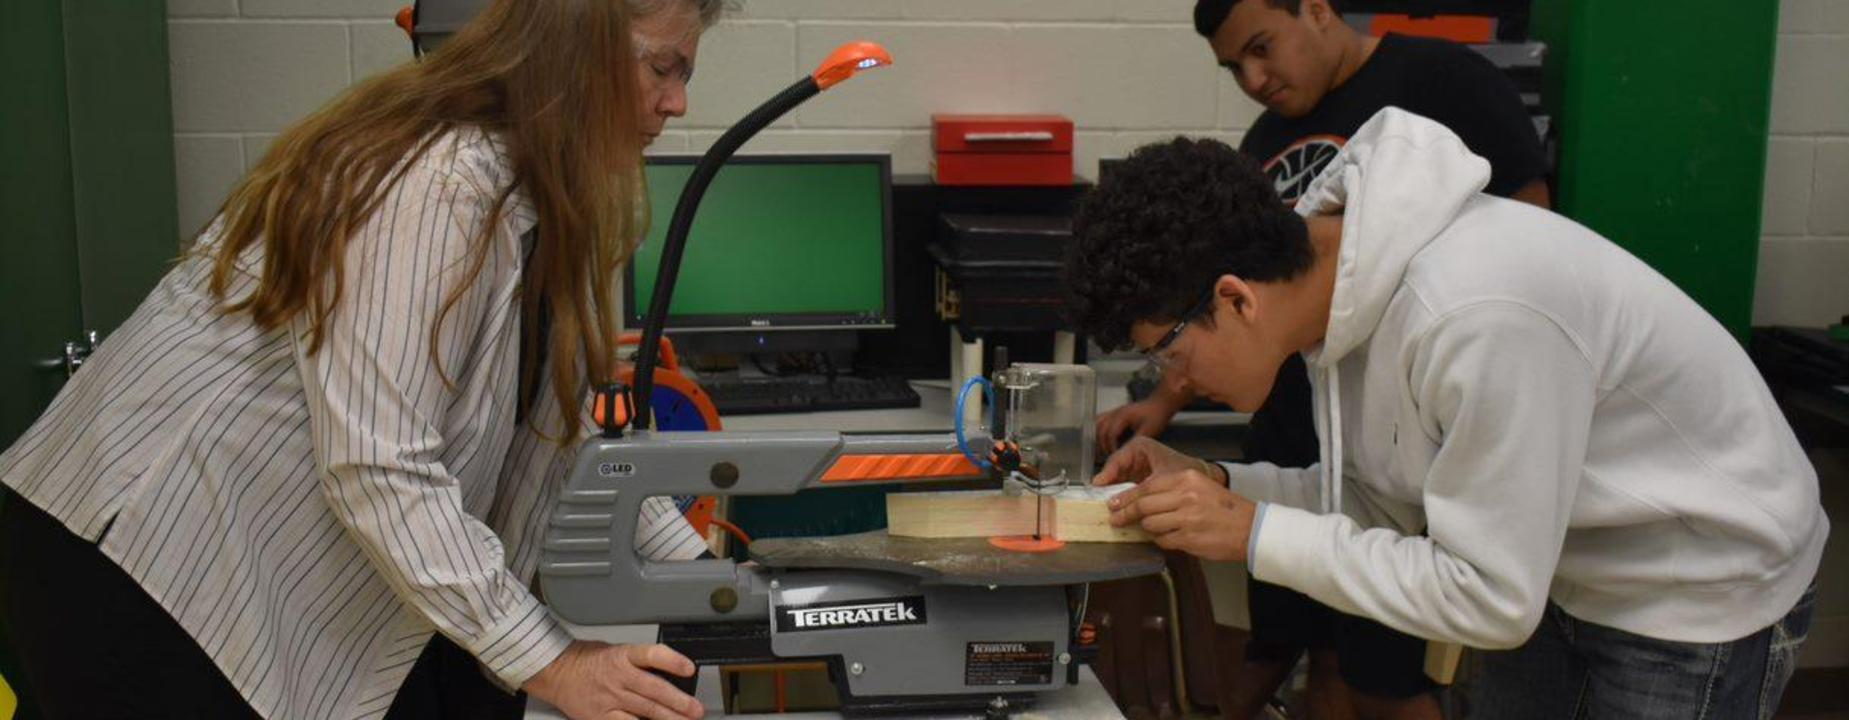 Student cutting wood